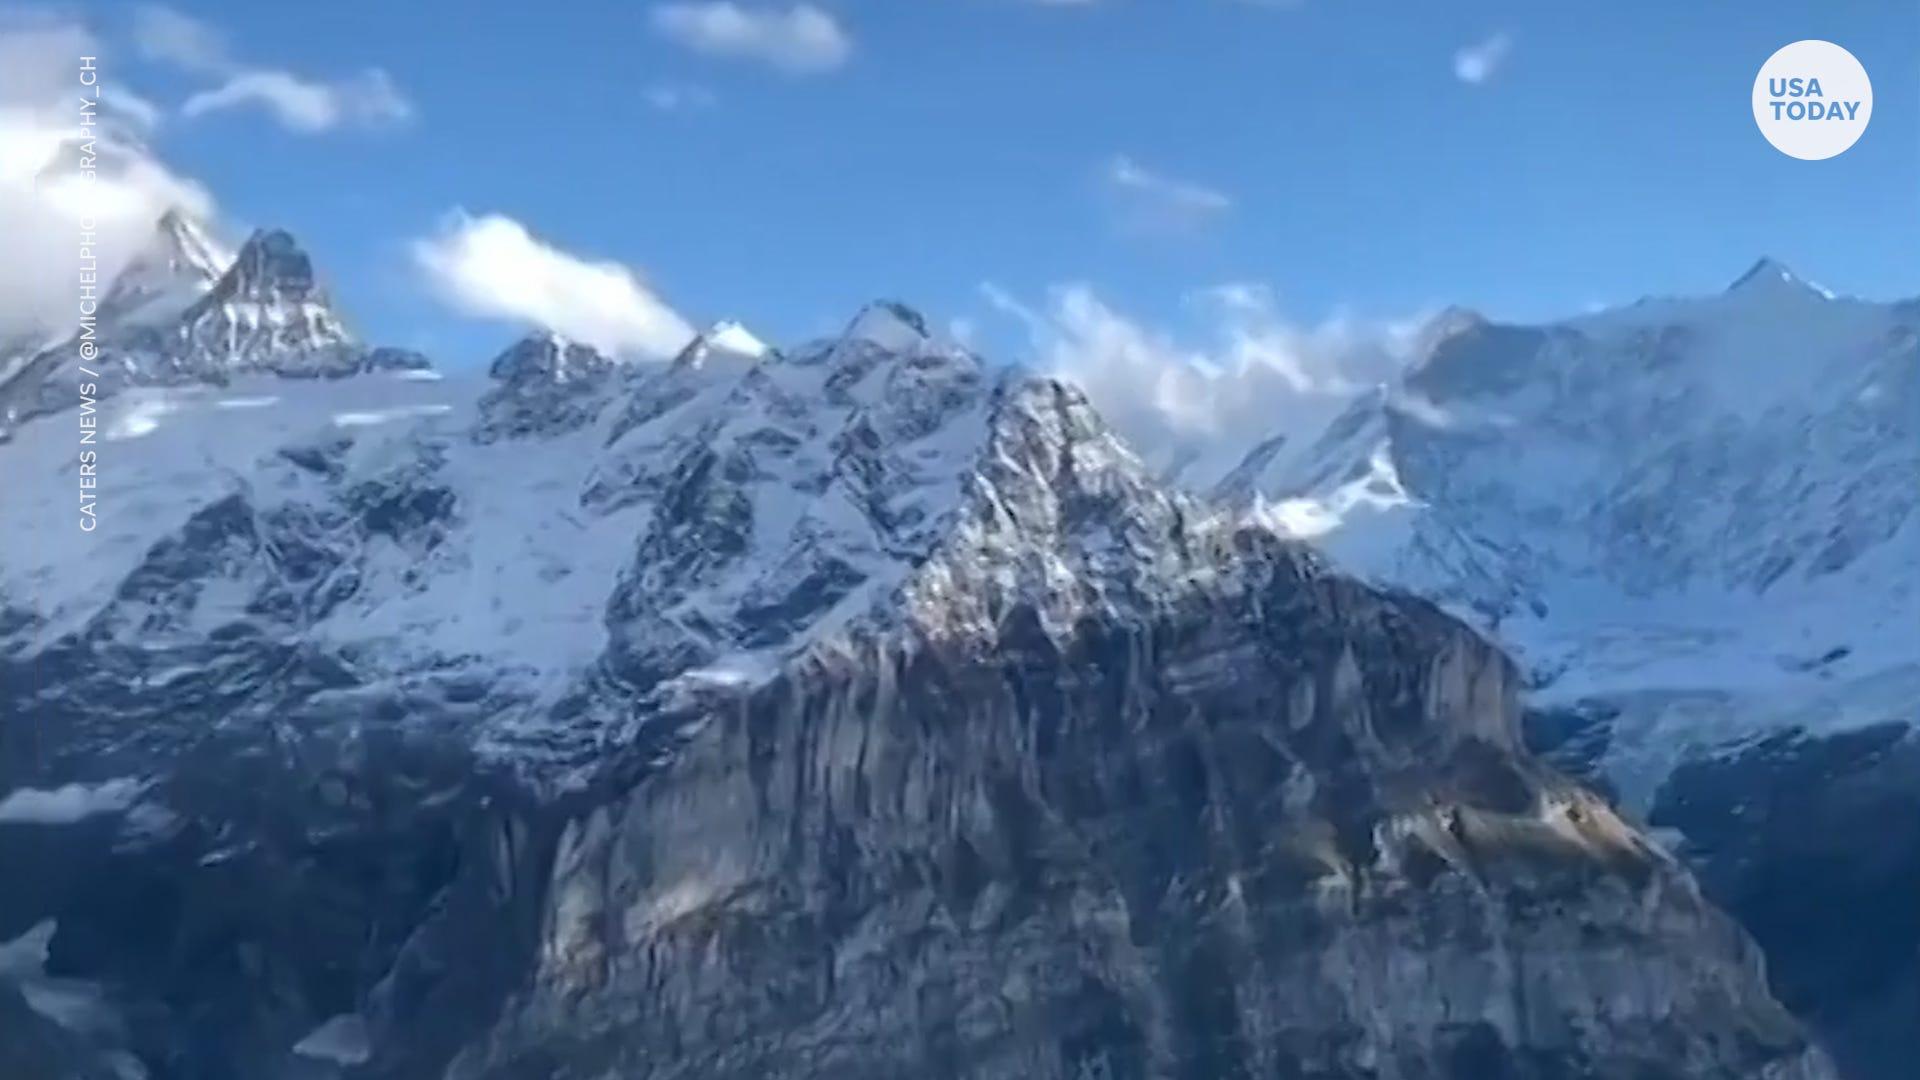 Woman standing on platform captures beautiful view of Swiss Alps